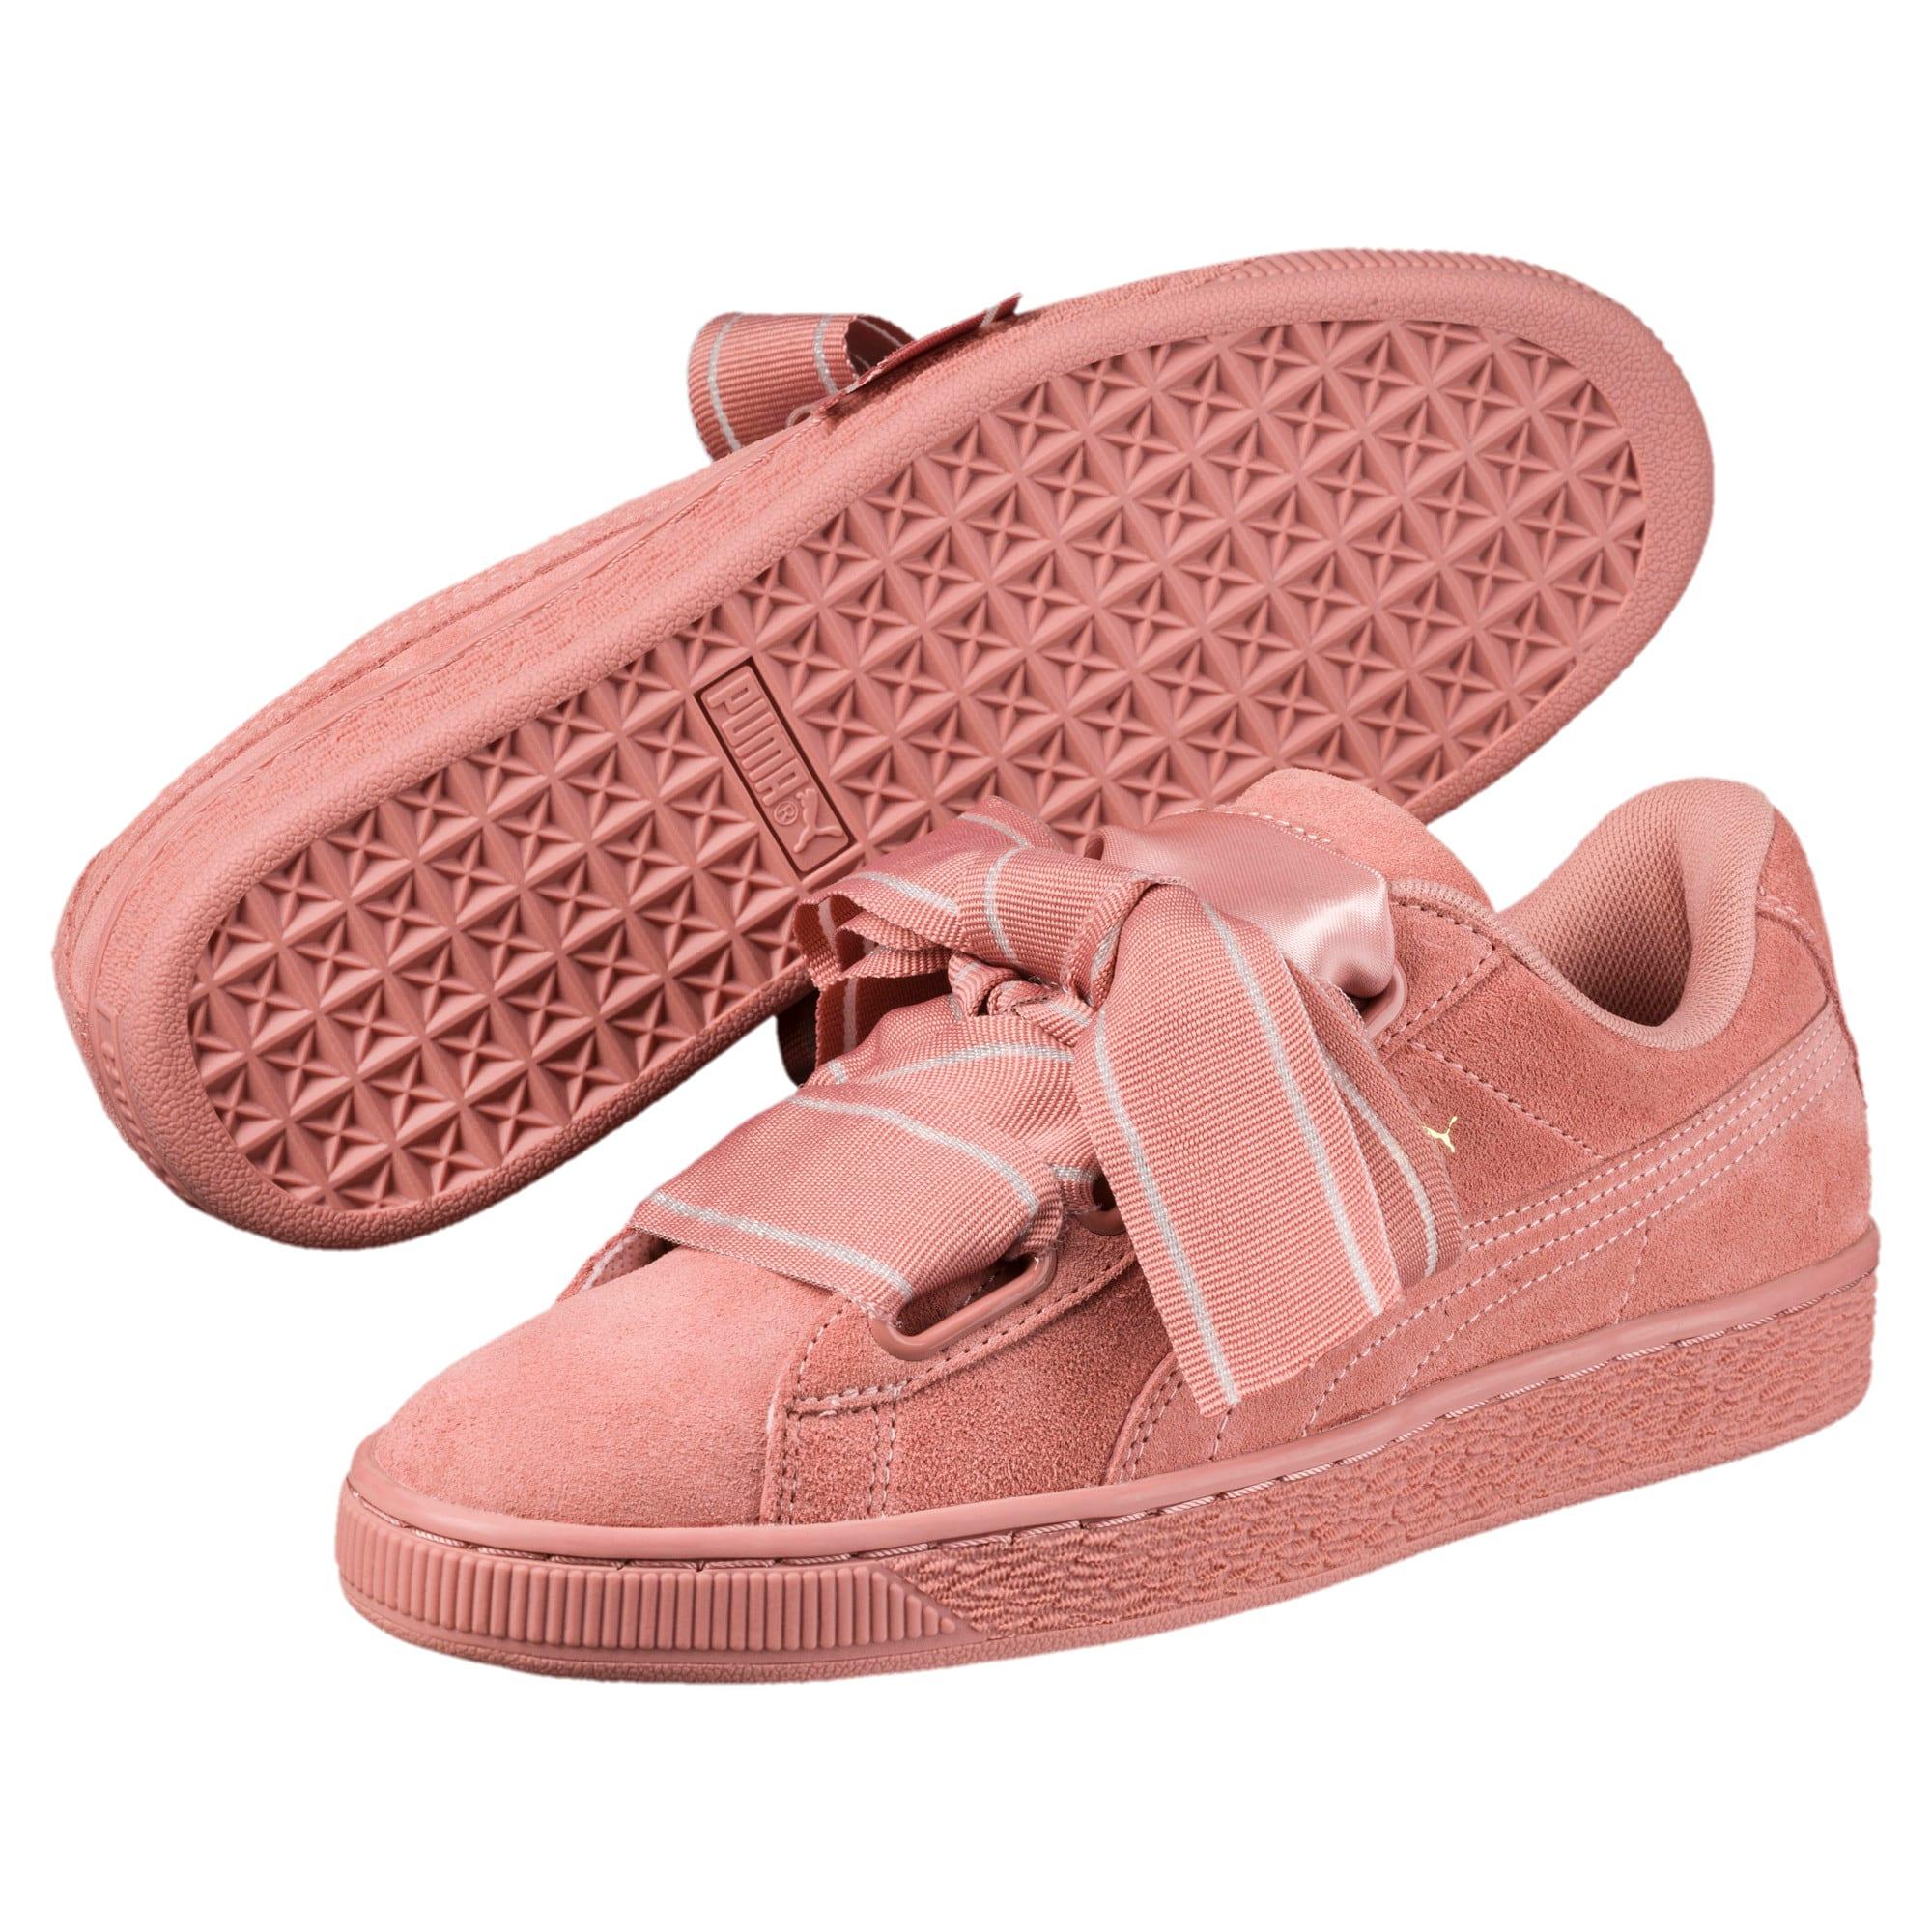 Thumbnail 2 of Suede Heart Satin II Women's Sneakers, Cameo Brown-Cameo Brown, medium